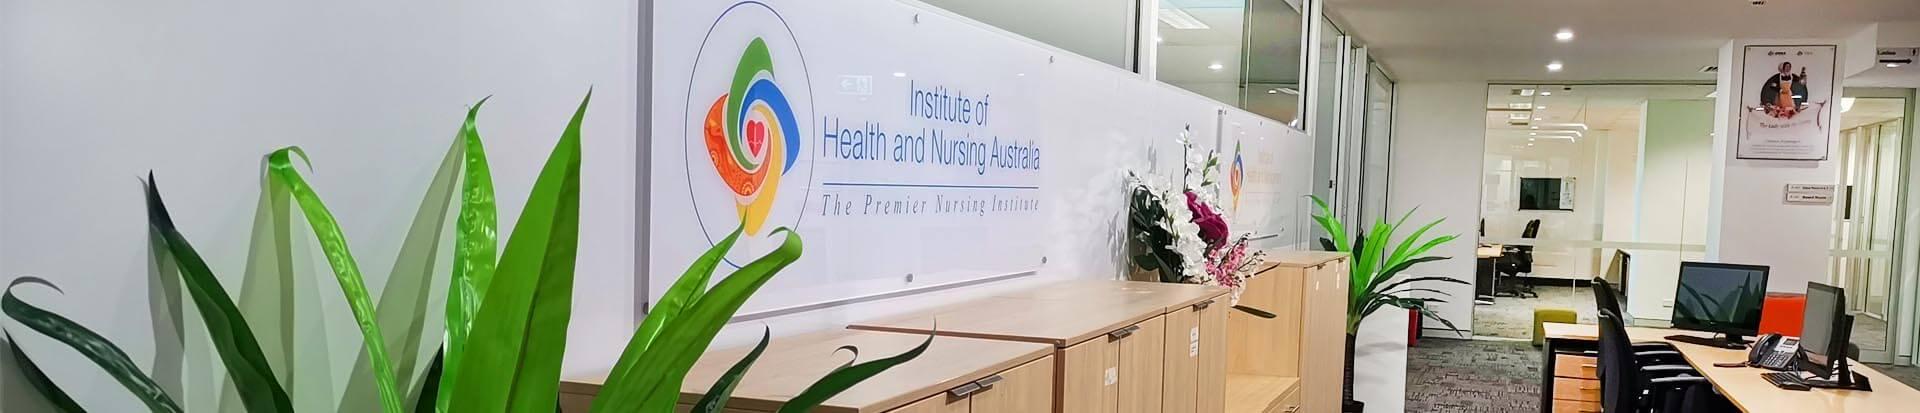 Institute of Health and Nursing Australia (IHNA) banner